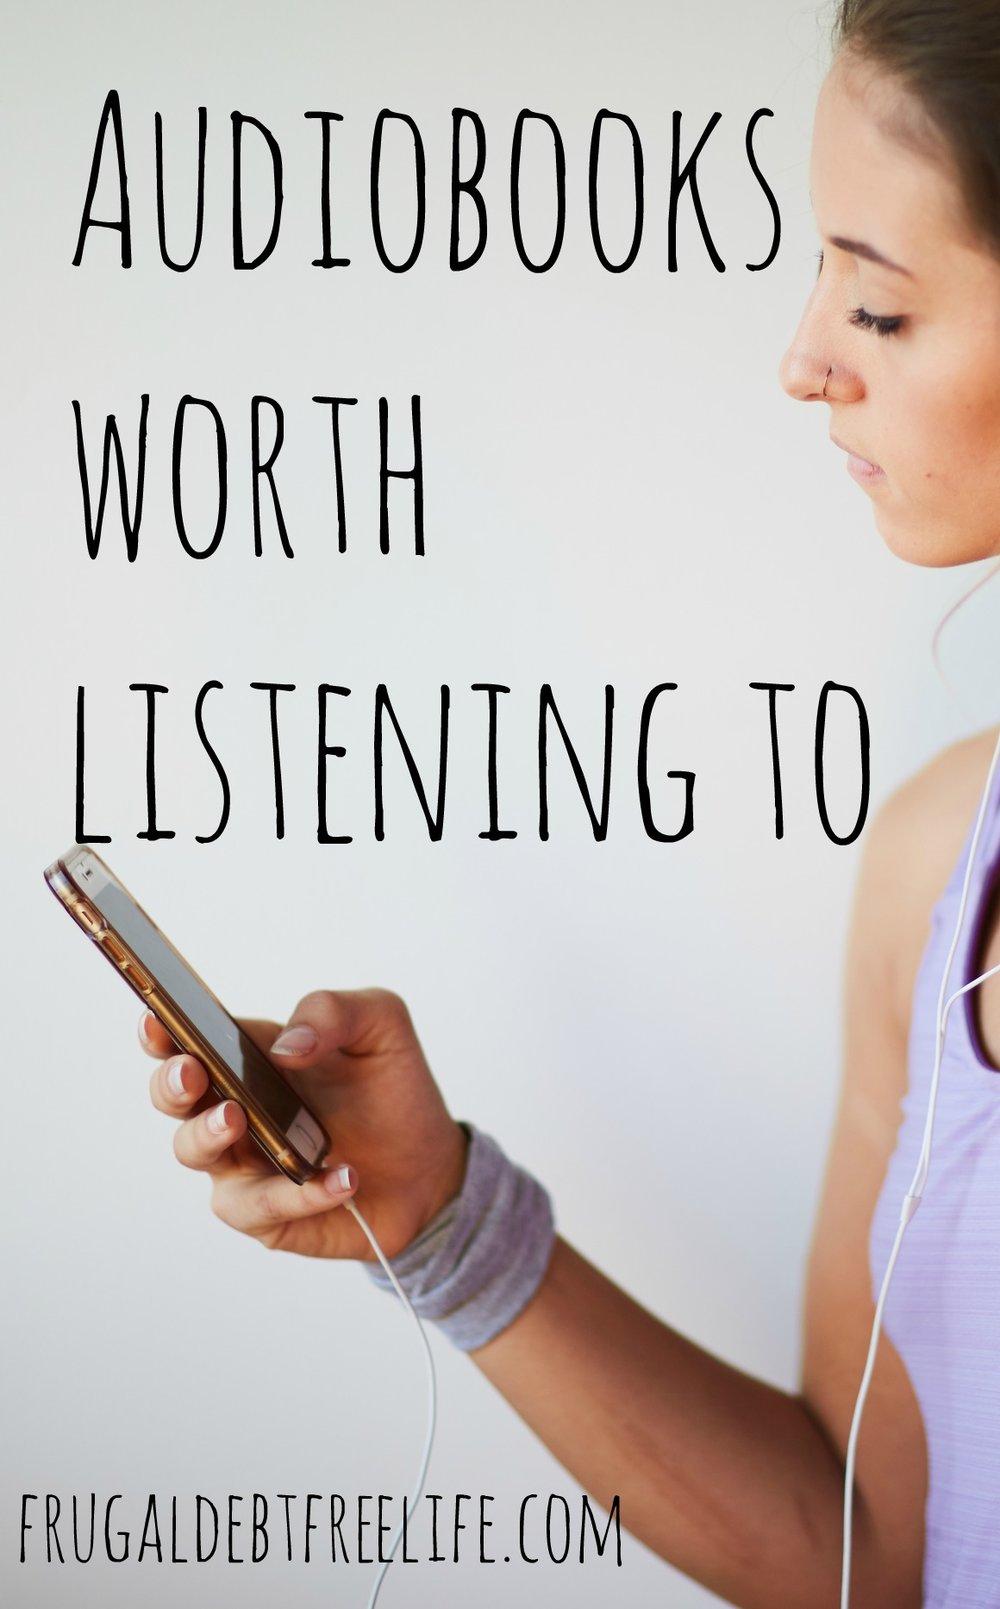 audio books worth listening to.jpg